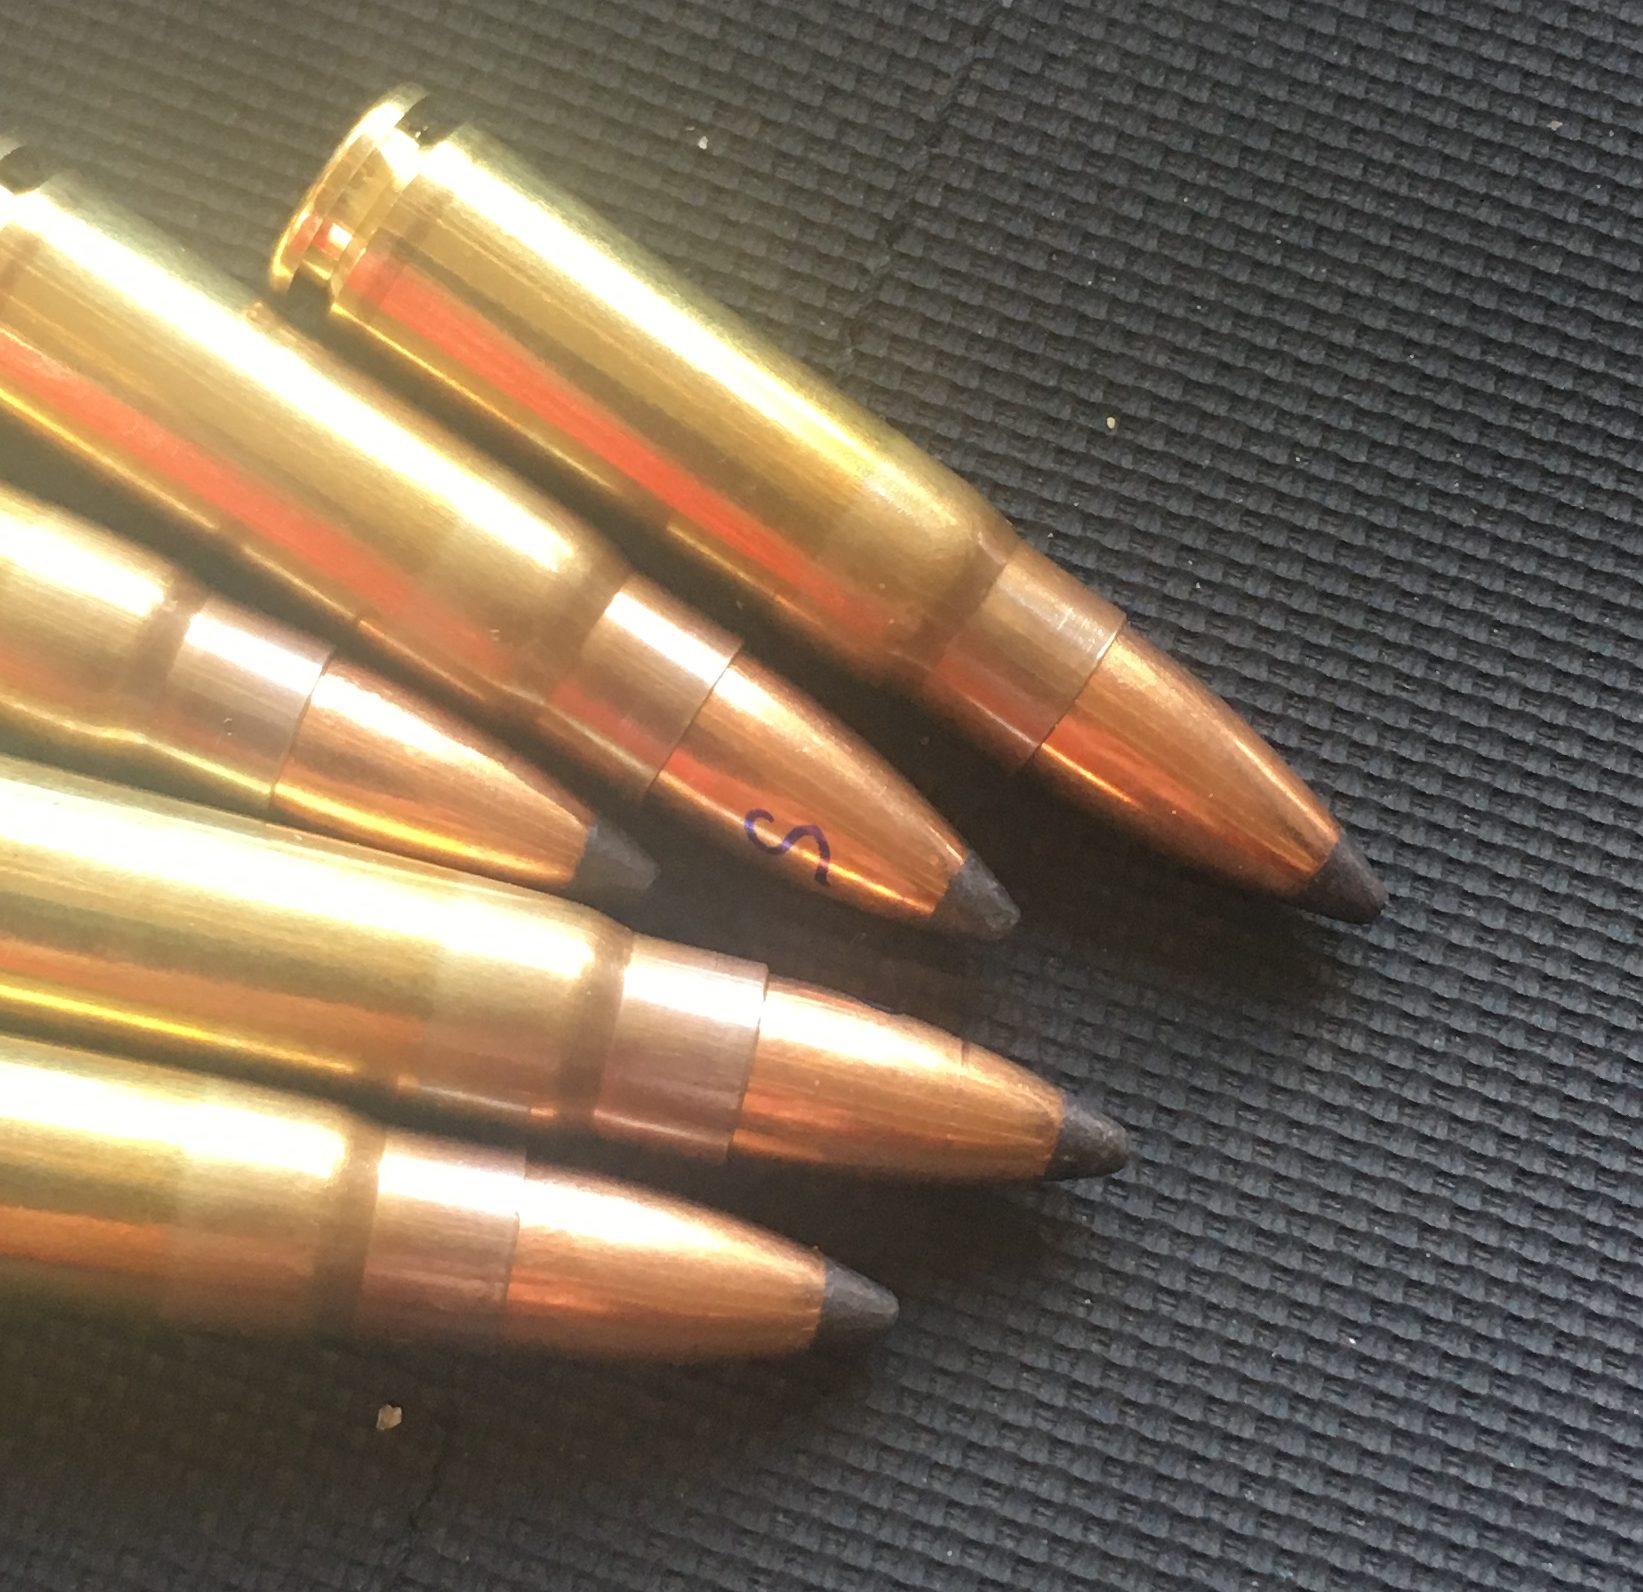 Review Howa Miniaction 7 62 39 Rifleshooter Com